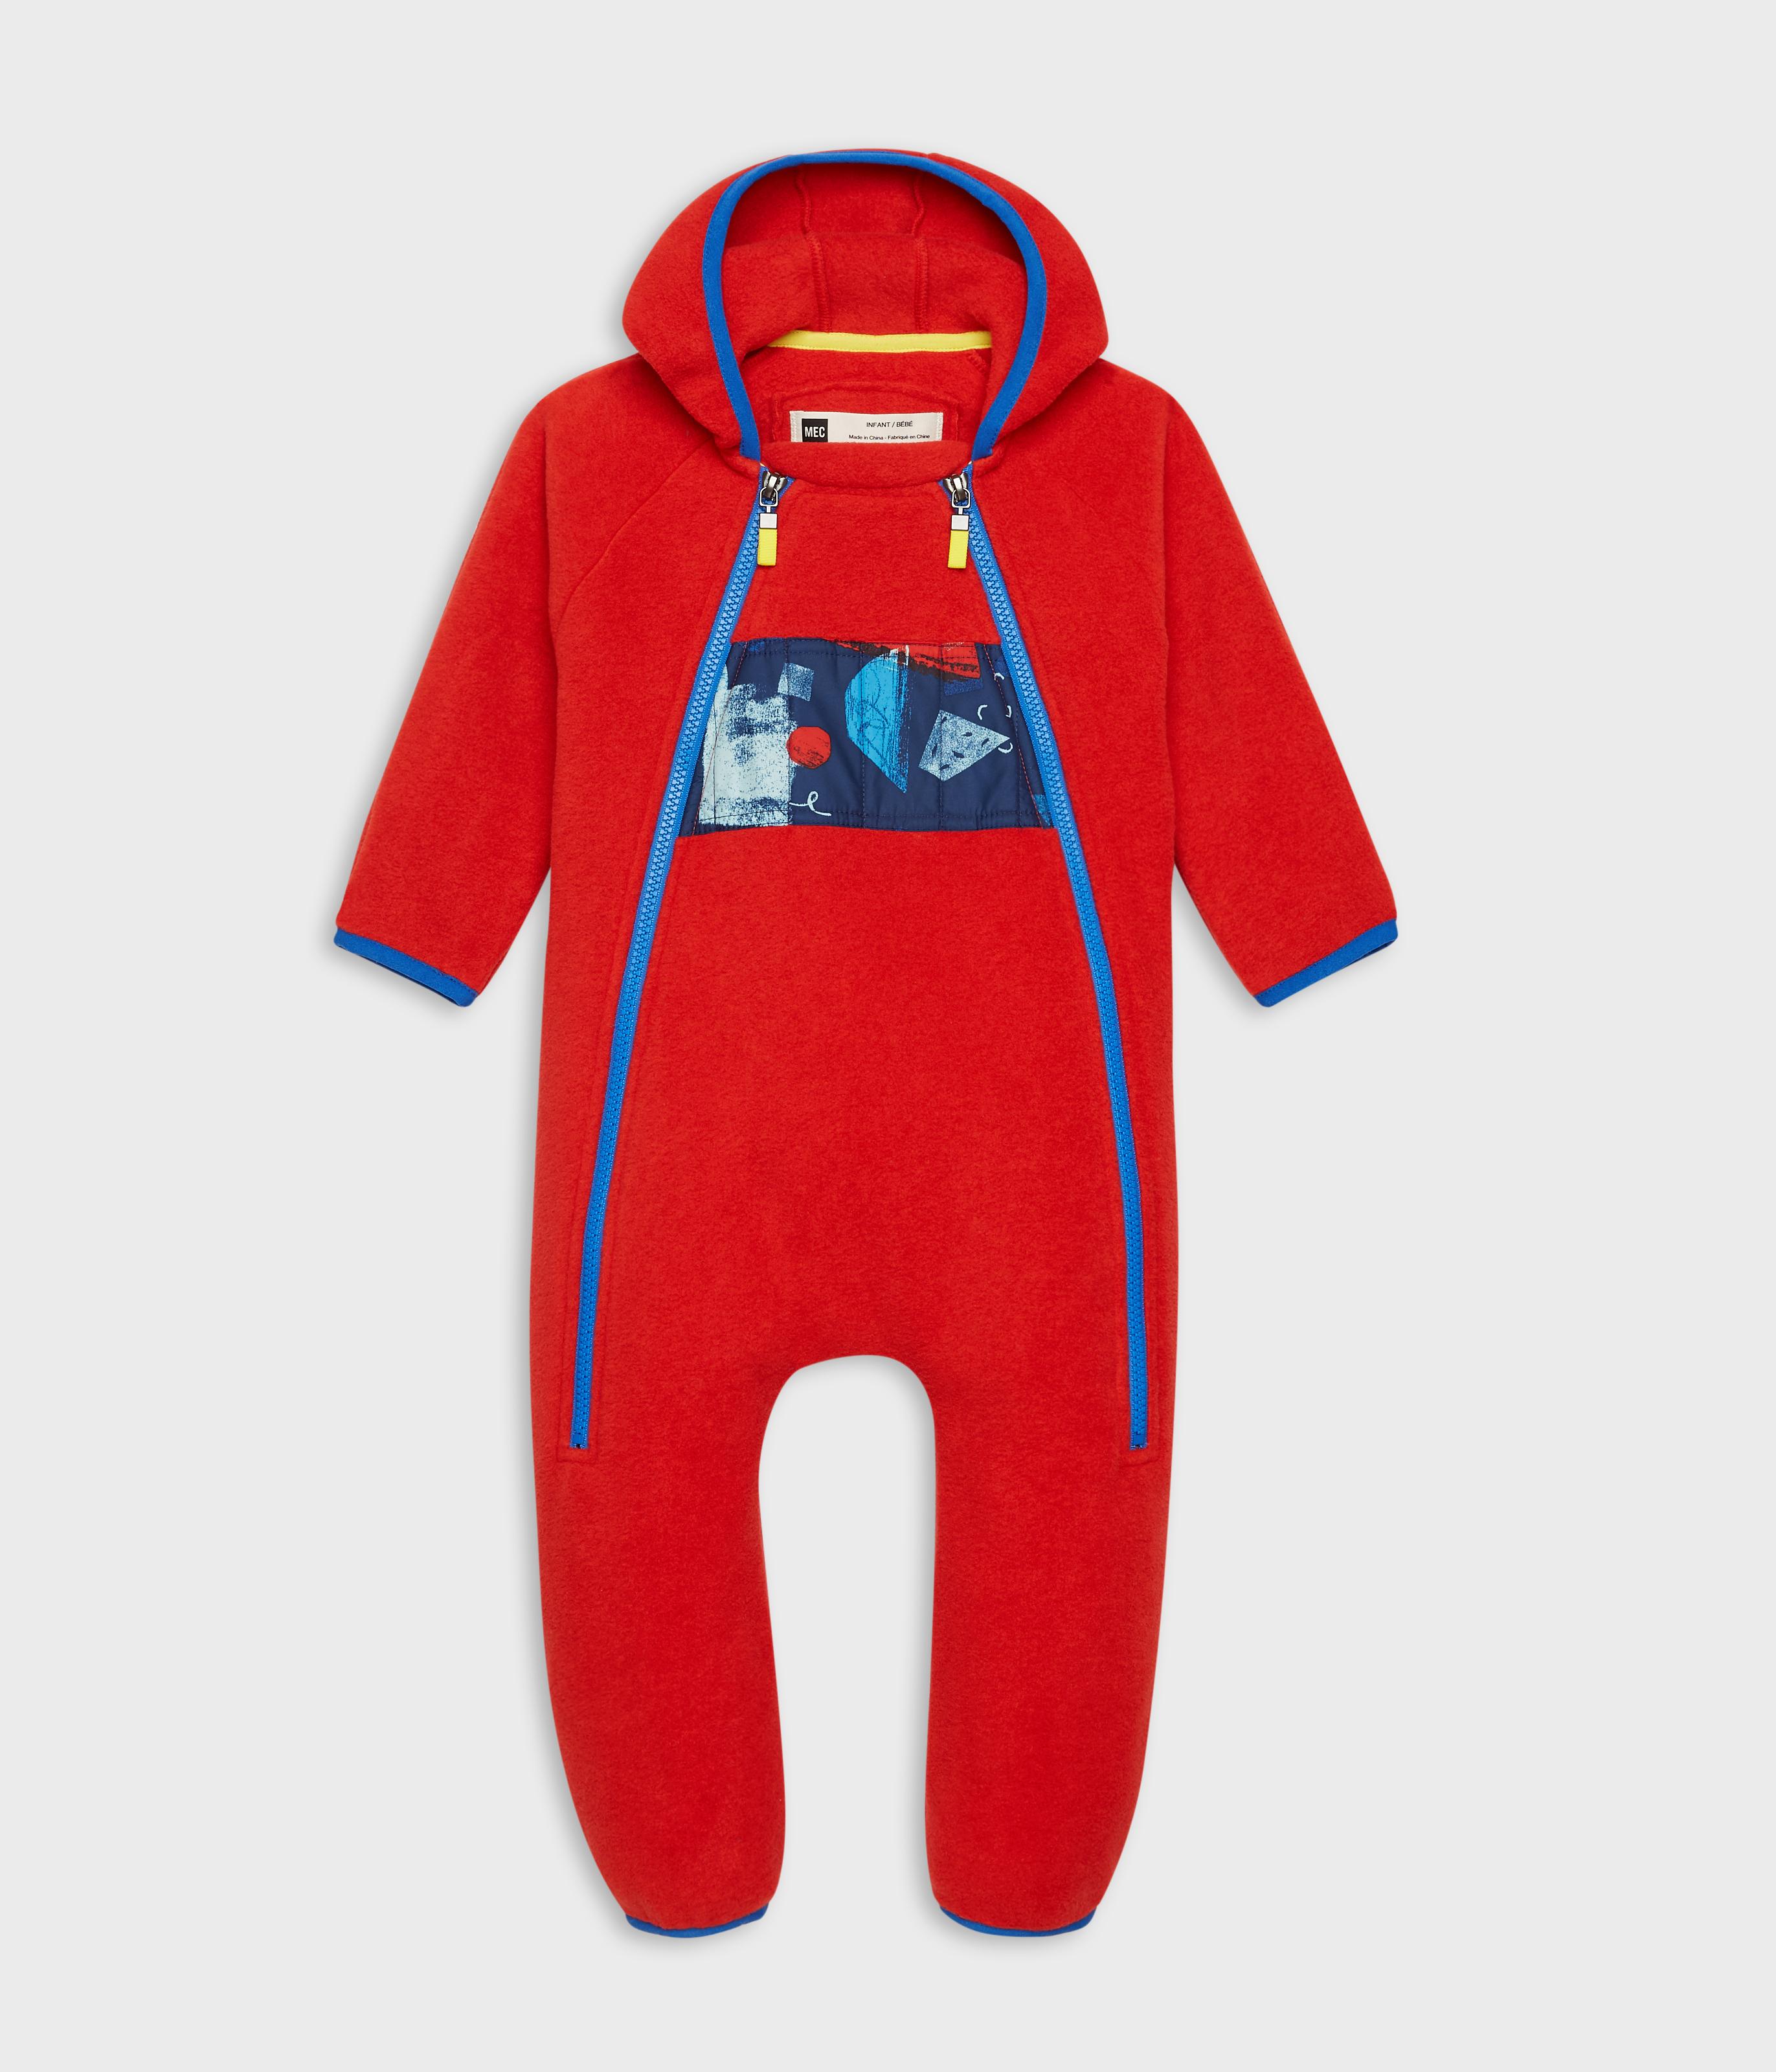 c299561ab MEC Ursus Bunting Suit - Infants